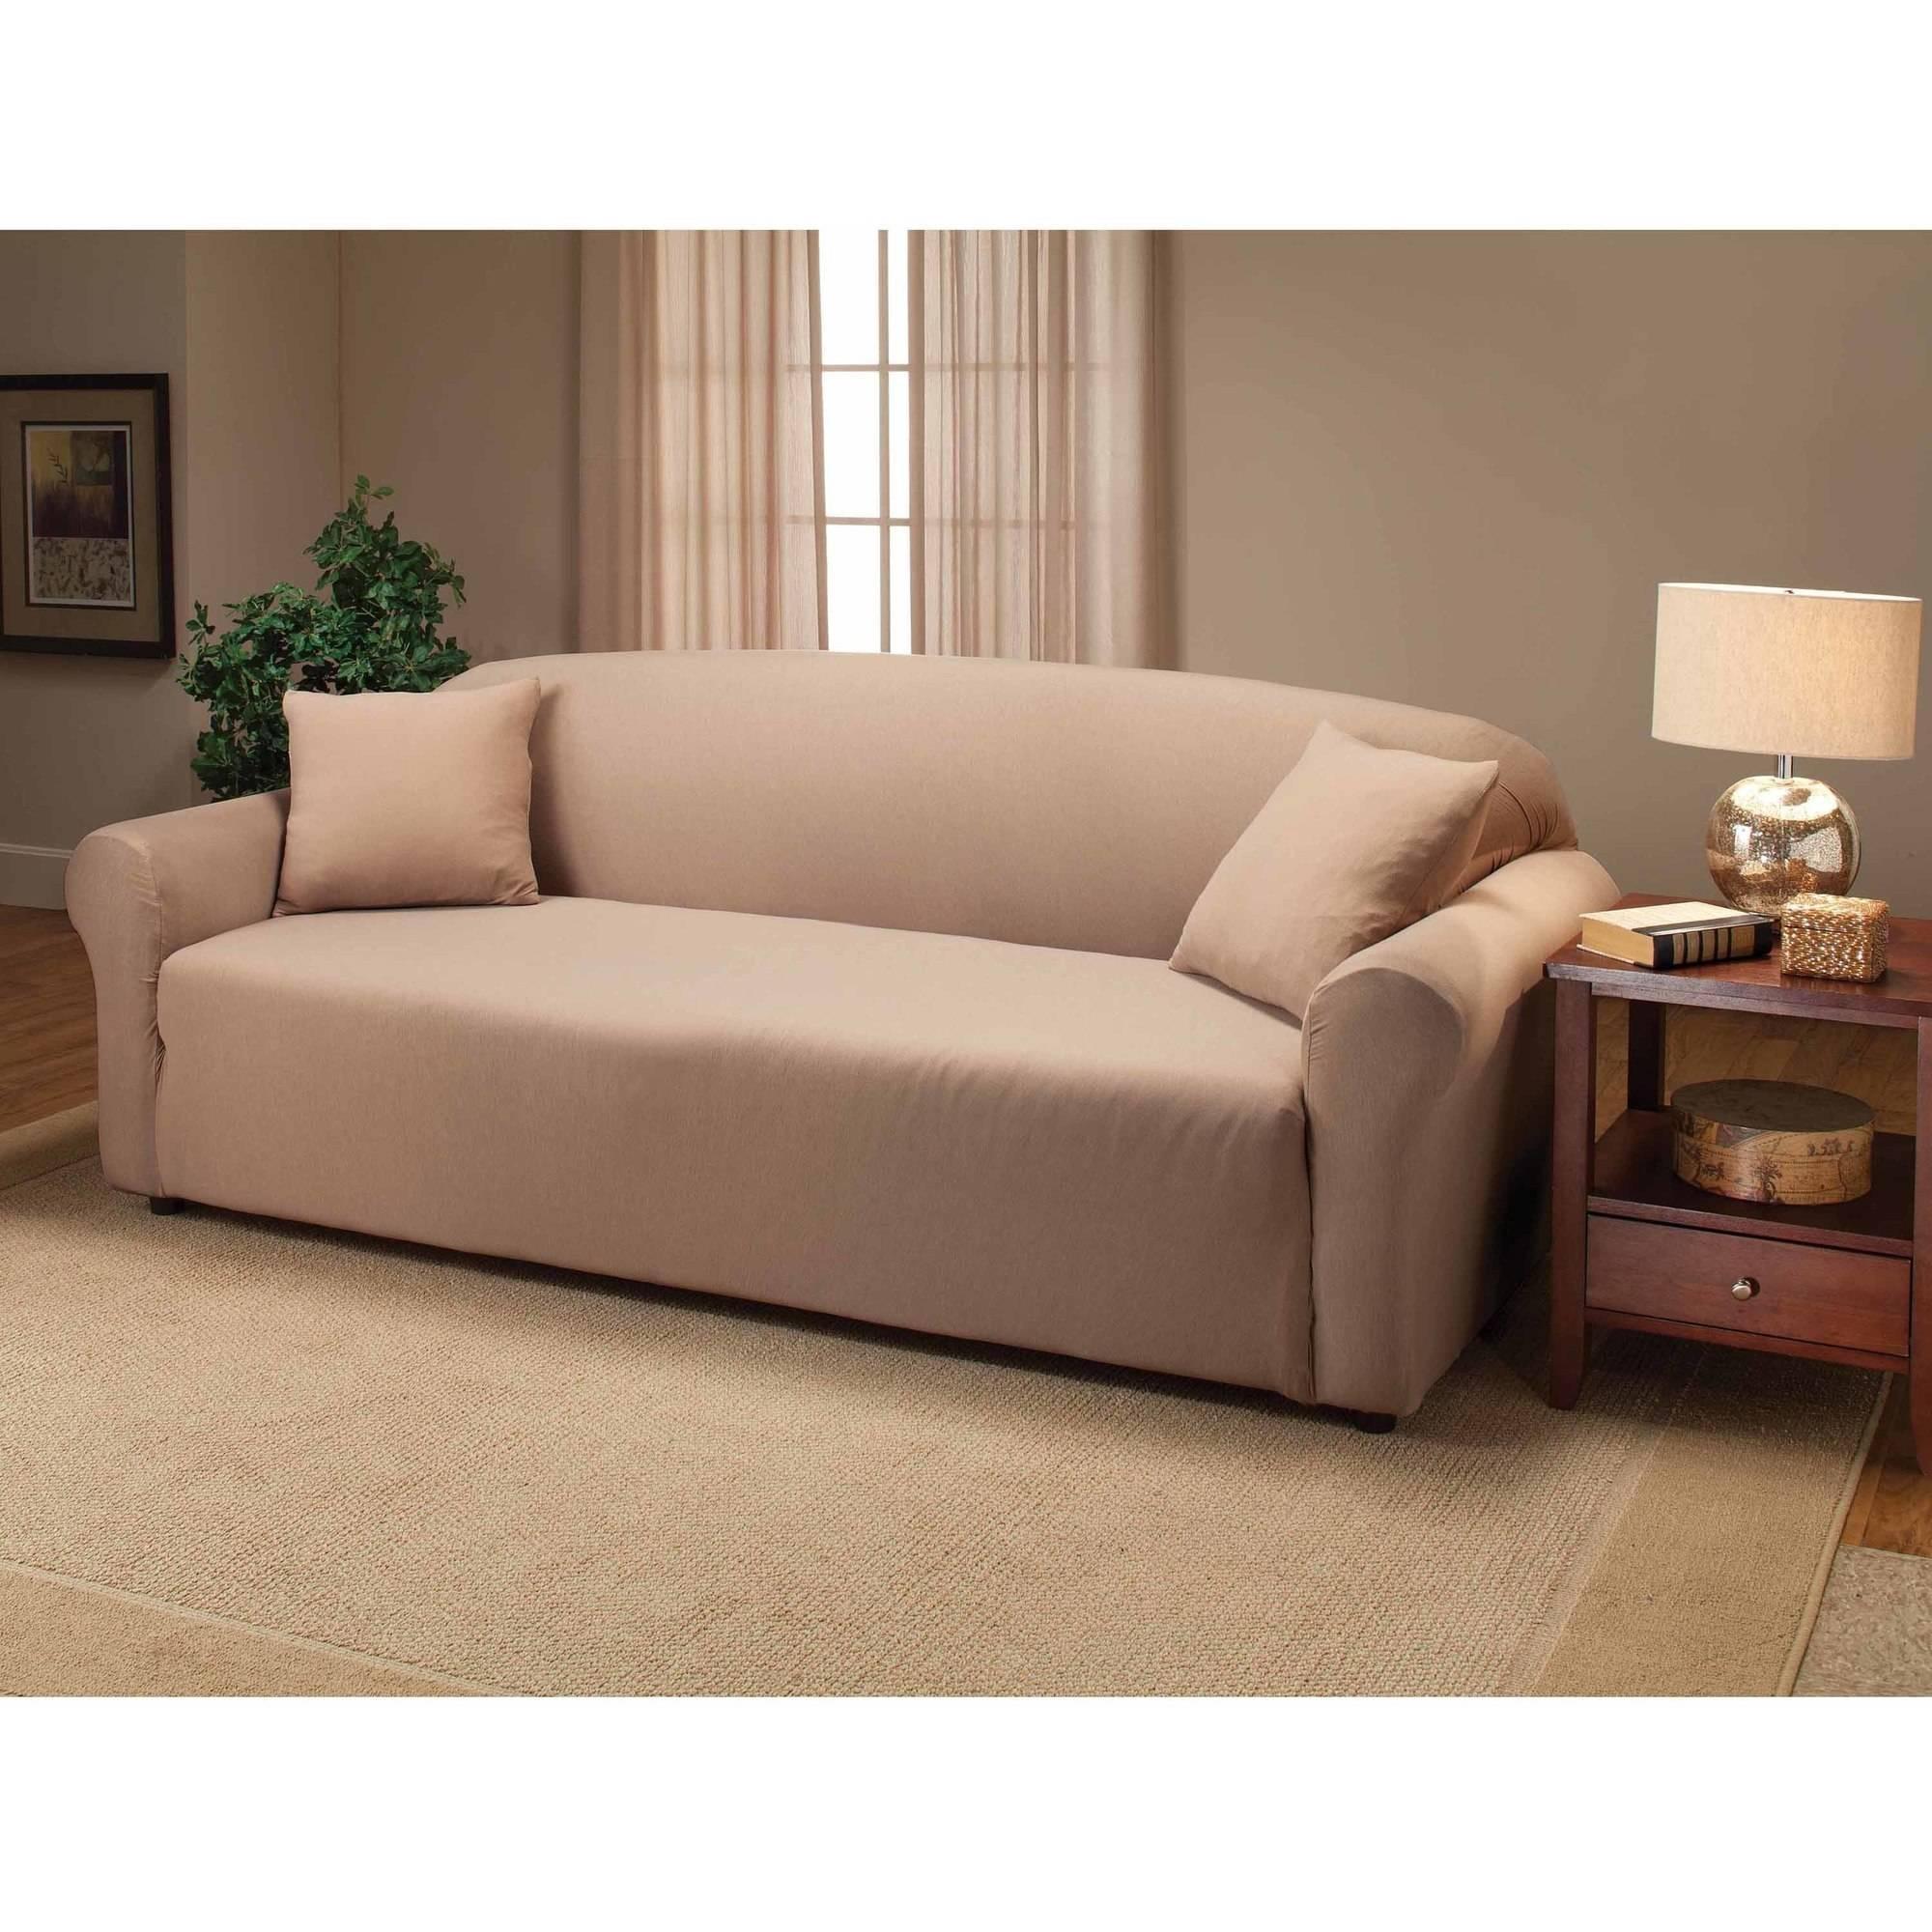 Sofas Center : Reclining Sofa Slipcover Slipcovers For Dual Regarding Recliner Sofa Slipcovers (Image 20 of 20)